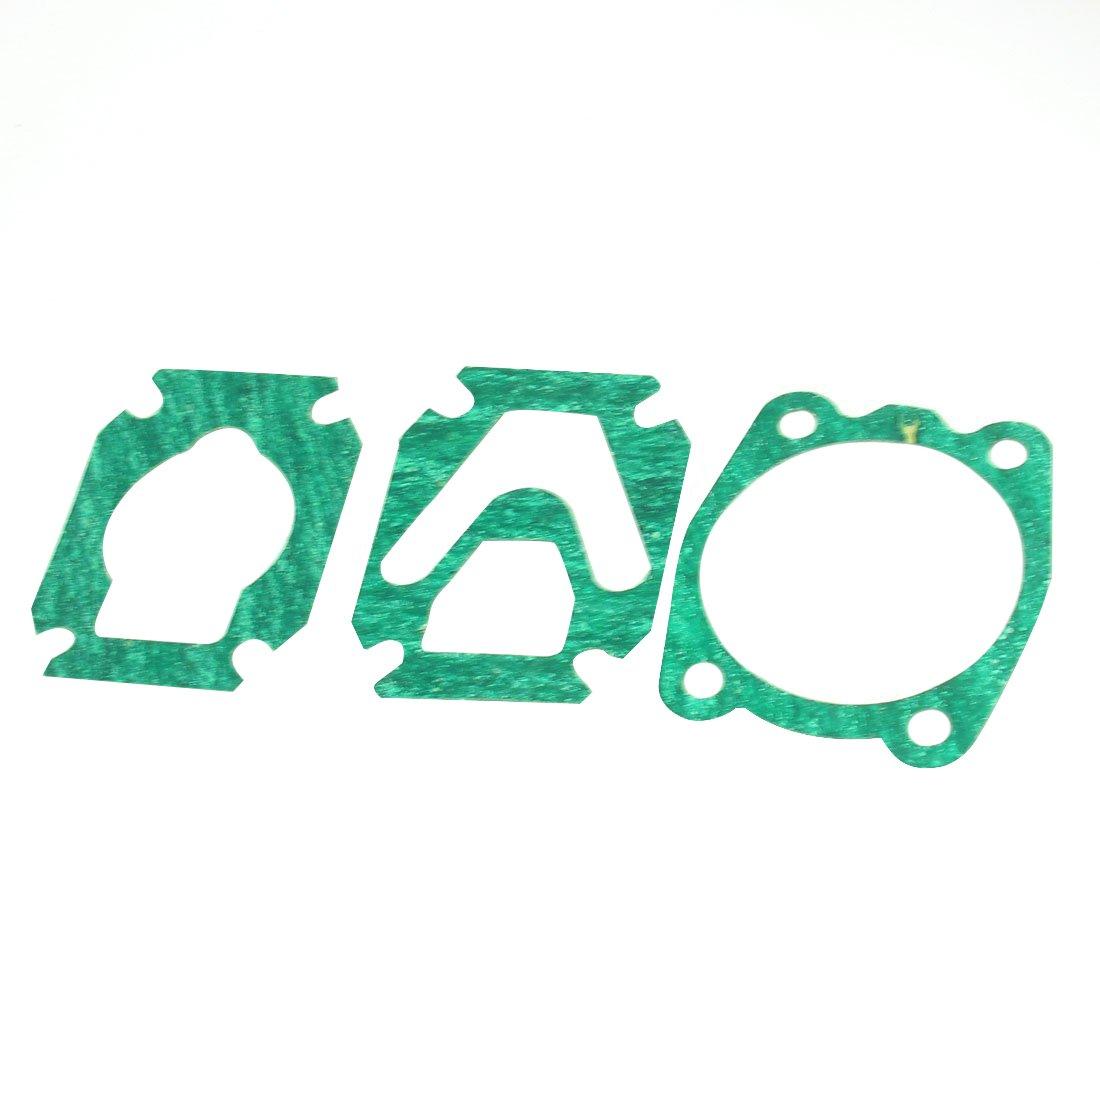 SODIAL(R) 3 in 1 Air Compressor Cylinder Head Base Valve Plate Sealing Gasket